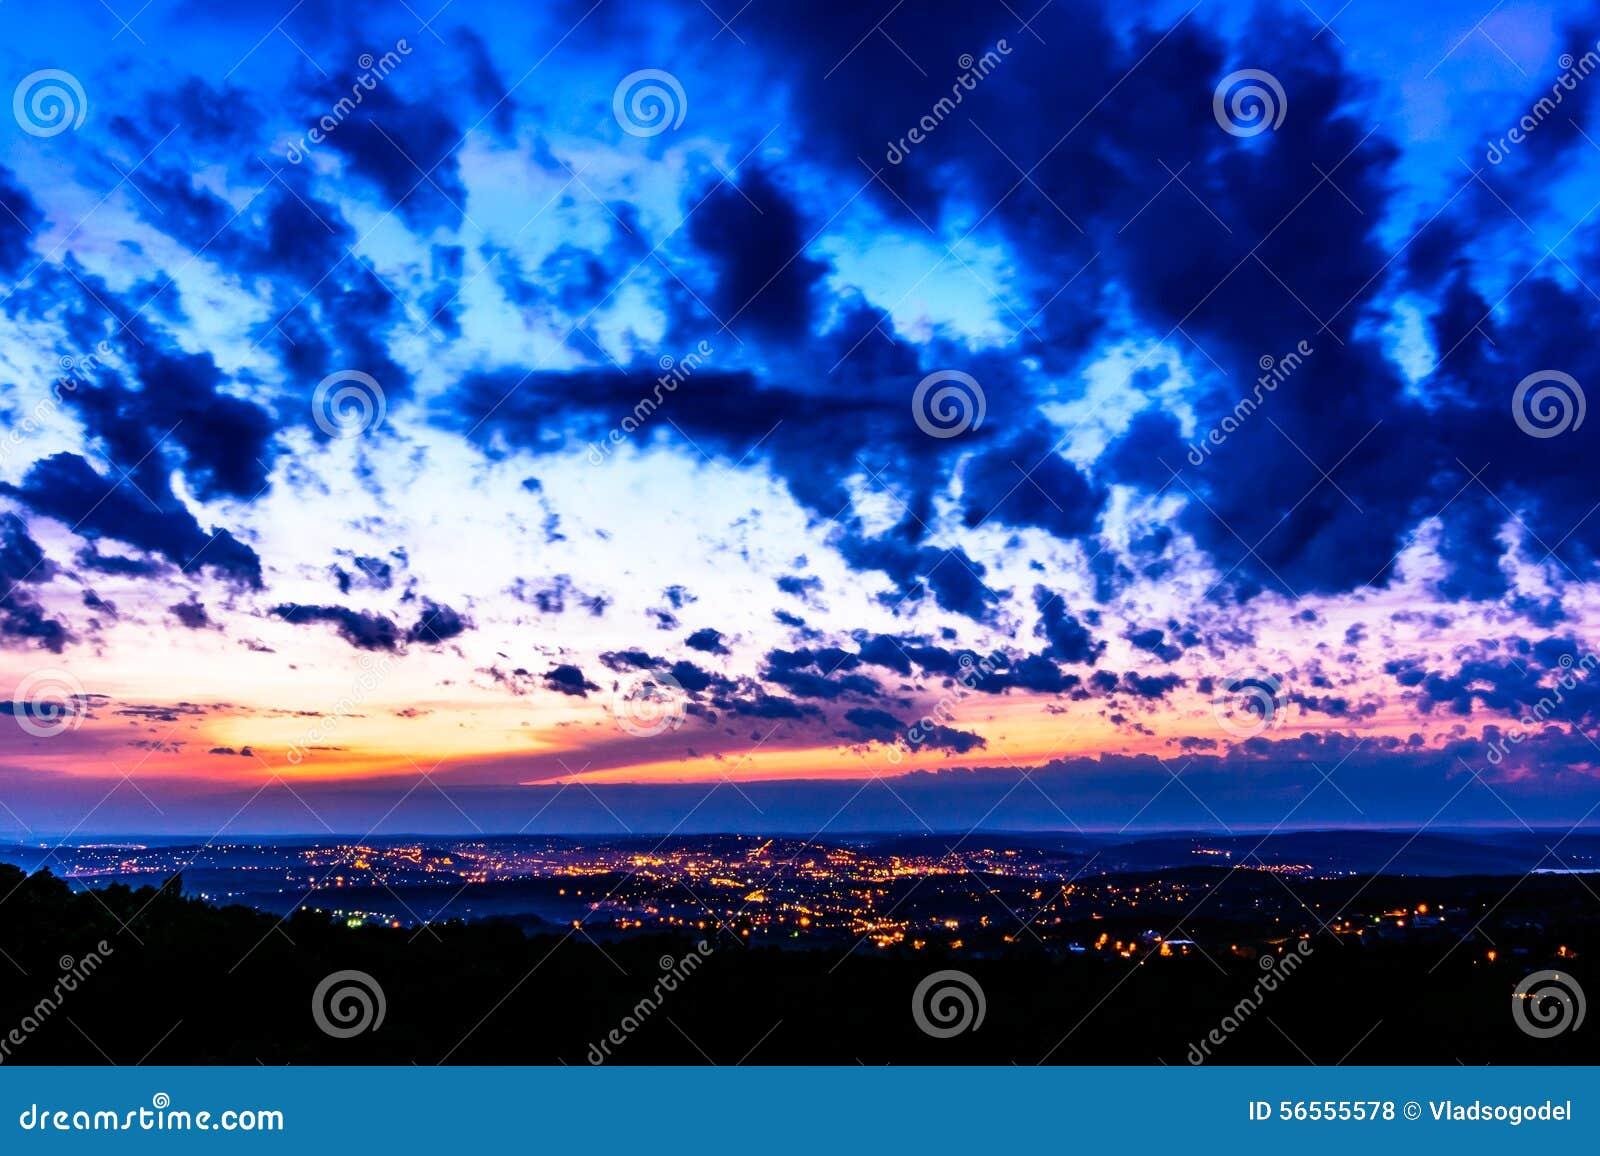 Download Τοπίο νύχτας που αντιπροσωπεύει την πόλη Iasi που φωτίζεται τη νύχτα στη Ρουμανία Άποψη από το λόφο Bucium Στοκ Εικόνες - εικόνα από νύχτα, αρχιτεκτονικής: 56555578